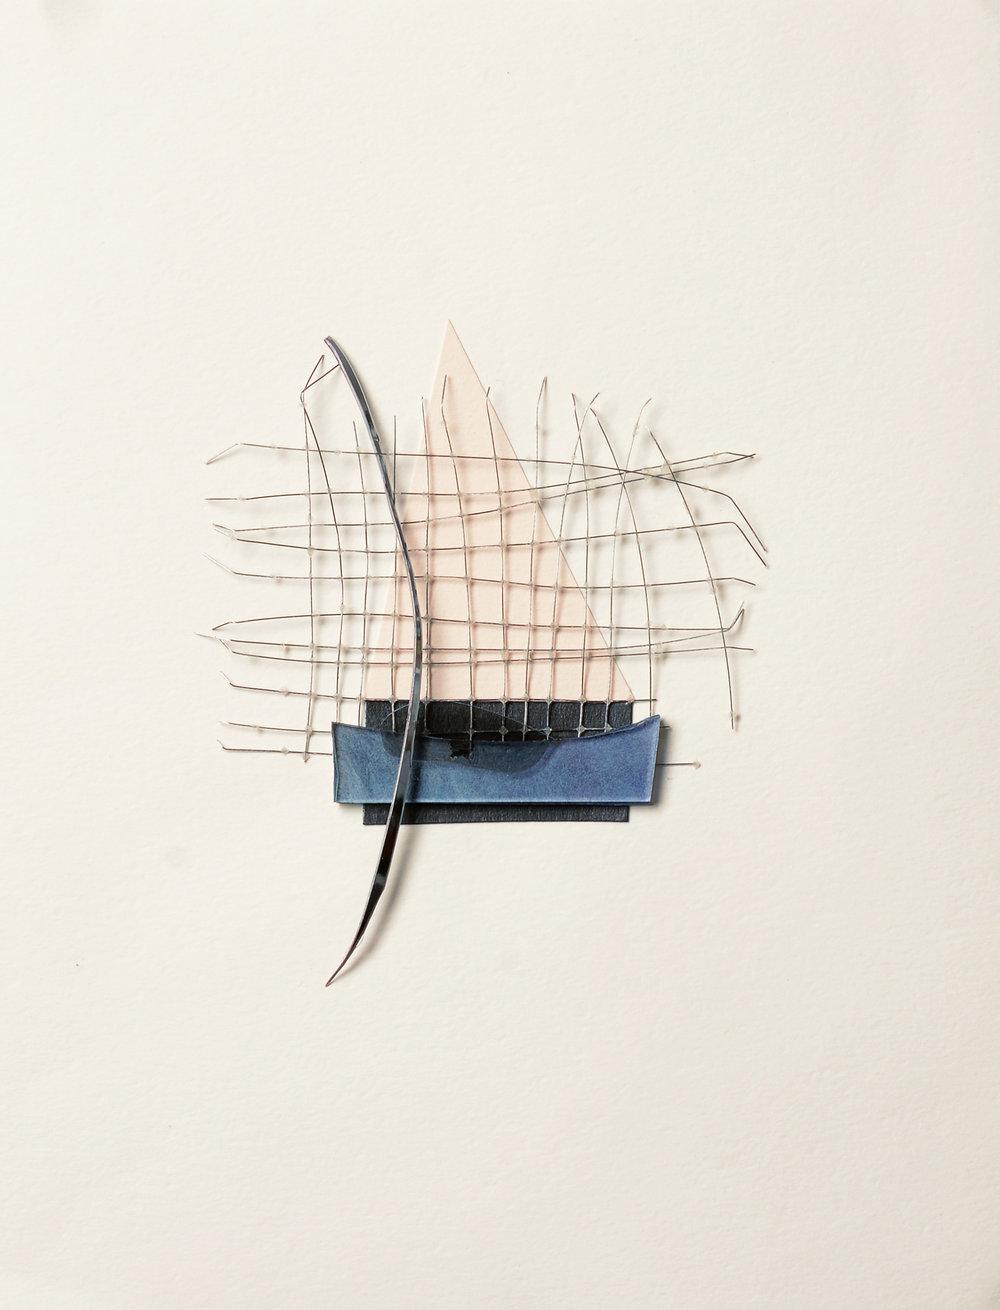 Quiet Dreams , 2018 Mixed media on paper 11 x 8.5 inches